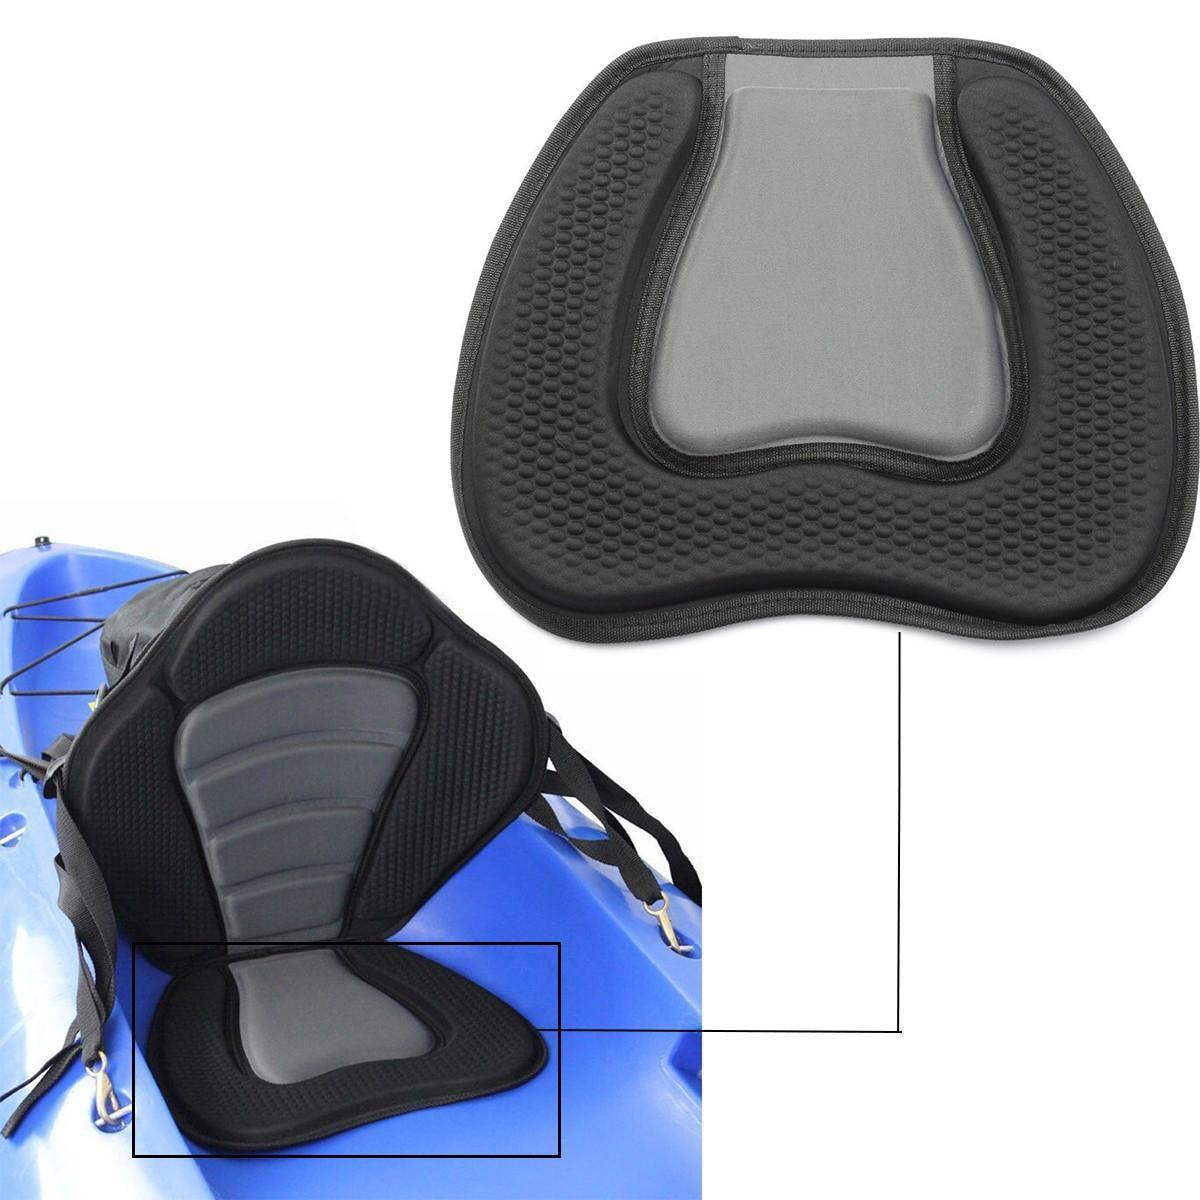 Mayitr 38x32cm Kayak Soft Seat Cushion Pad Canoe Fishing Boat Comfortable EVA Cushion Seat Padded Black For Boat